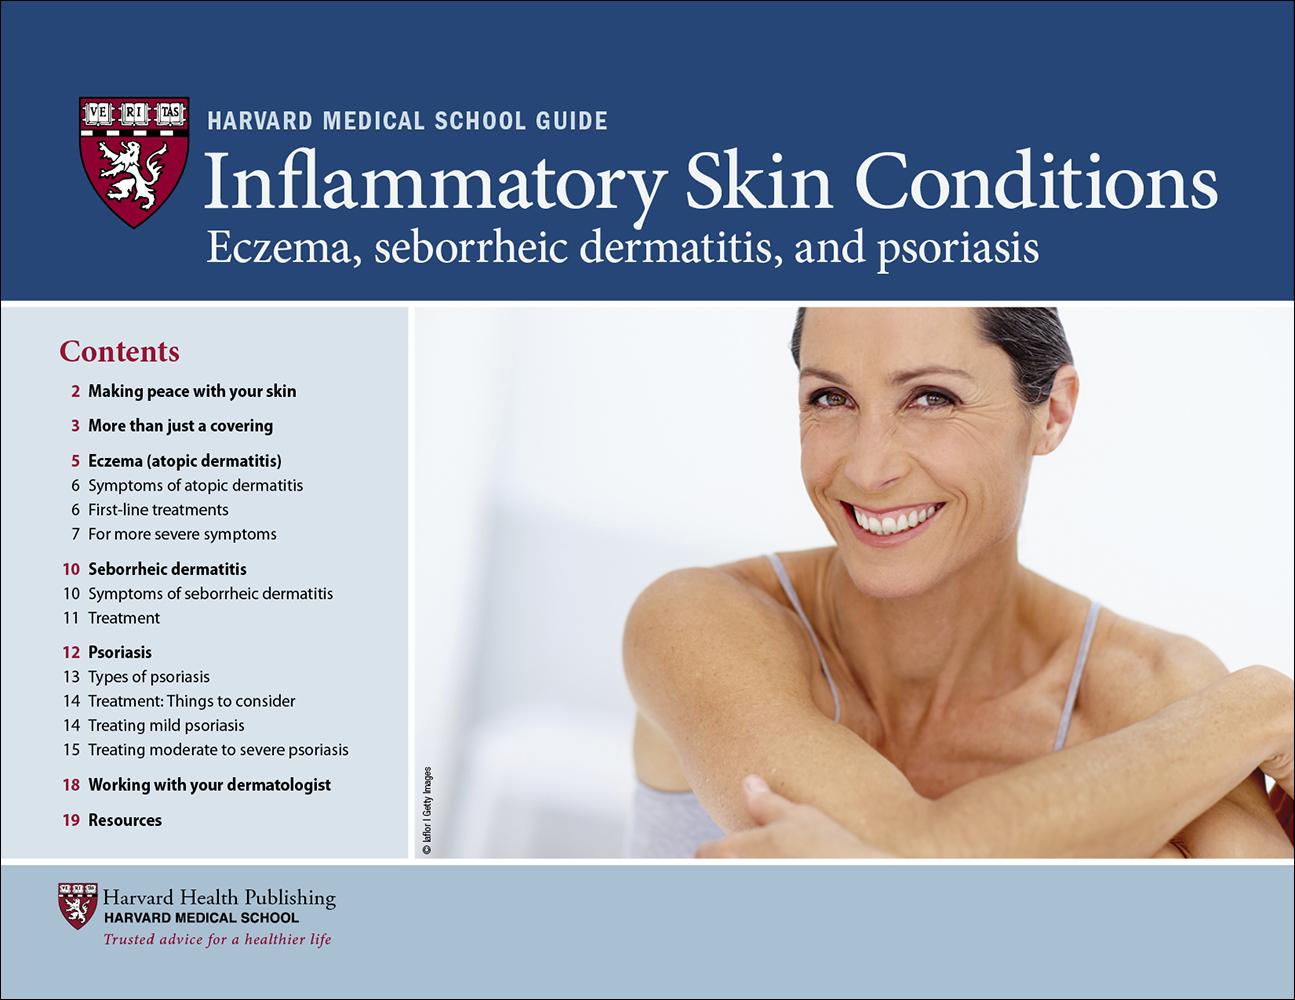 InflammatorySkin_SKCO0619_cover